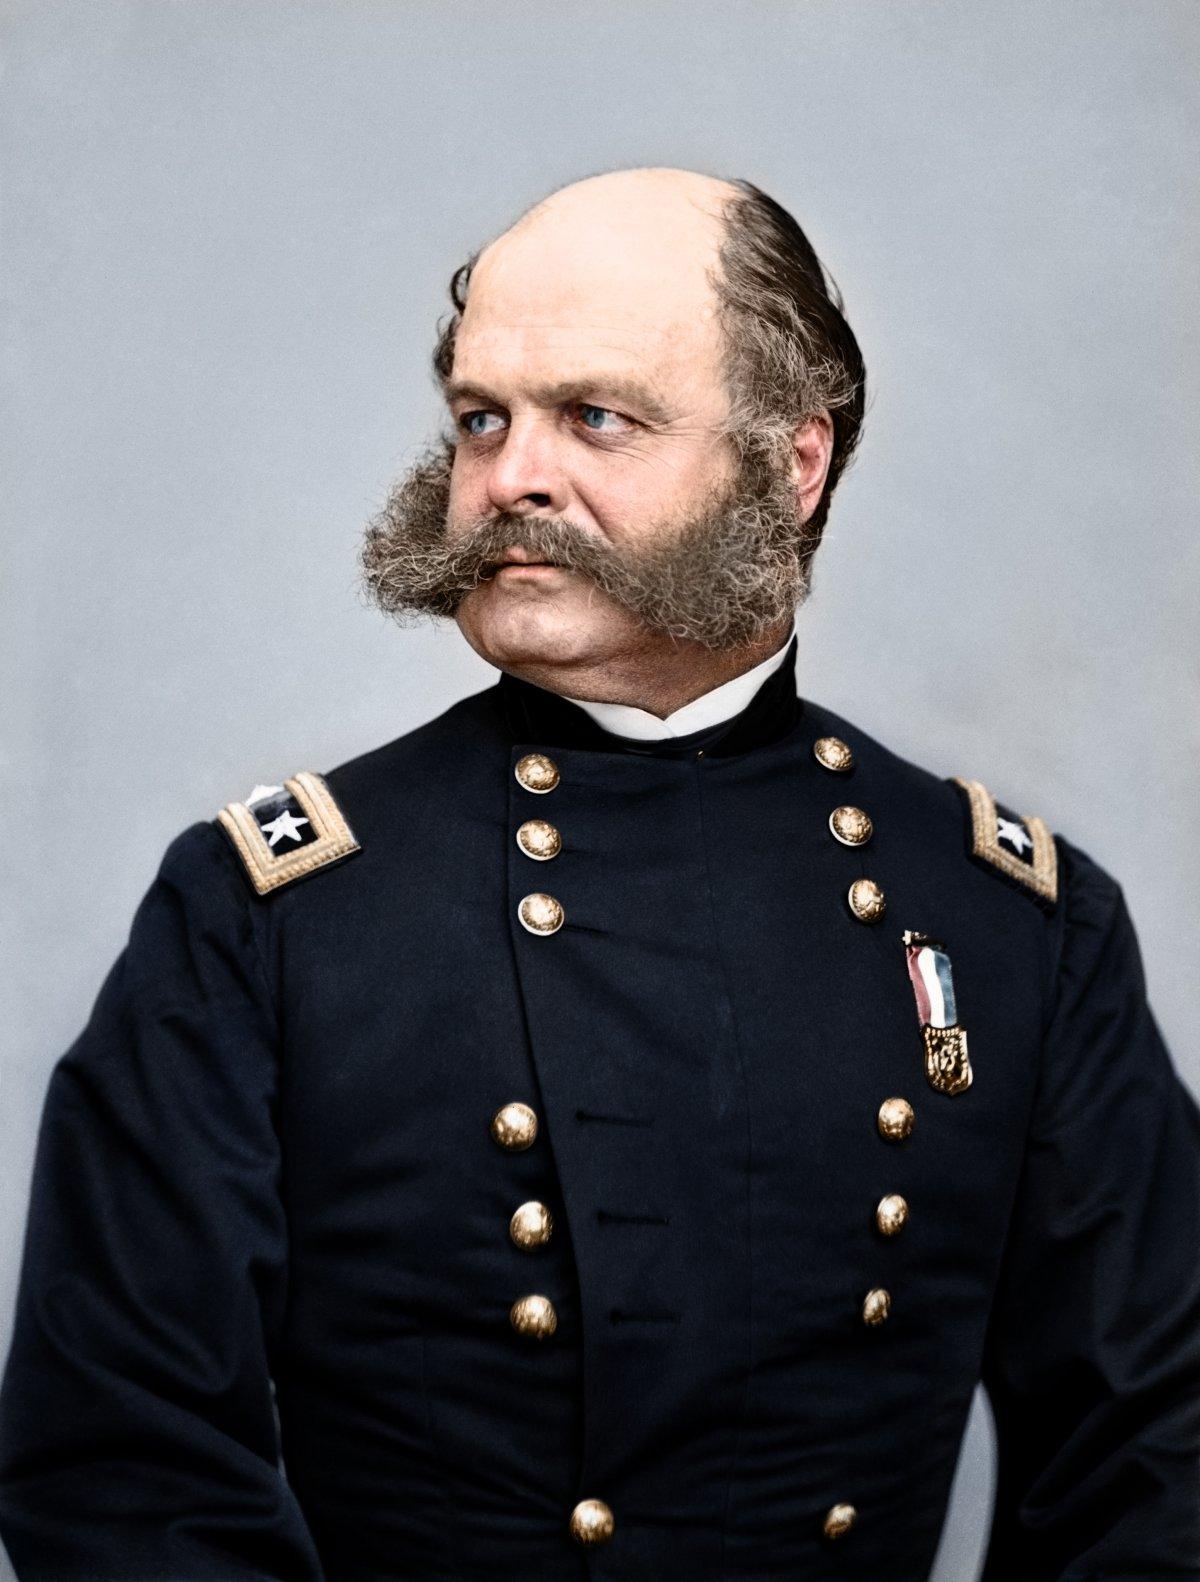 22_Major General Ambrose Burnside, the commander of the Union army of the Potomac_Fredericksburgi vereség.jpg